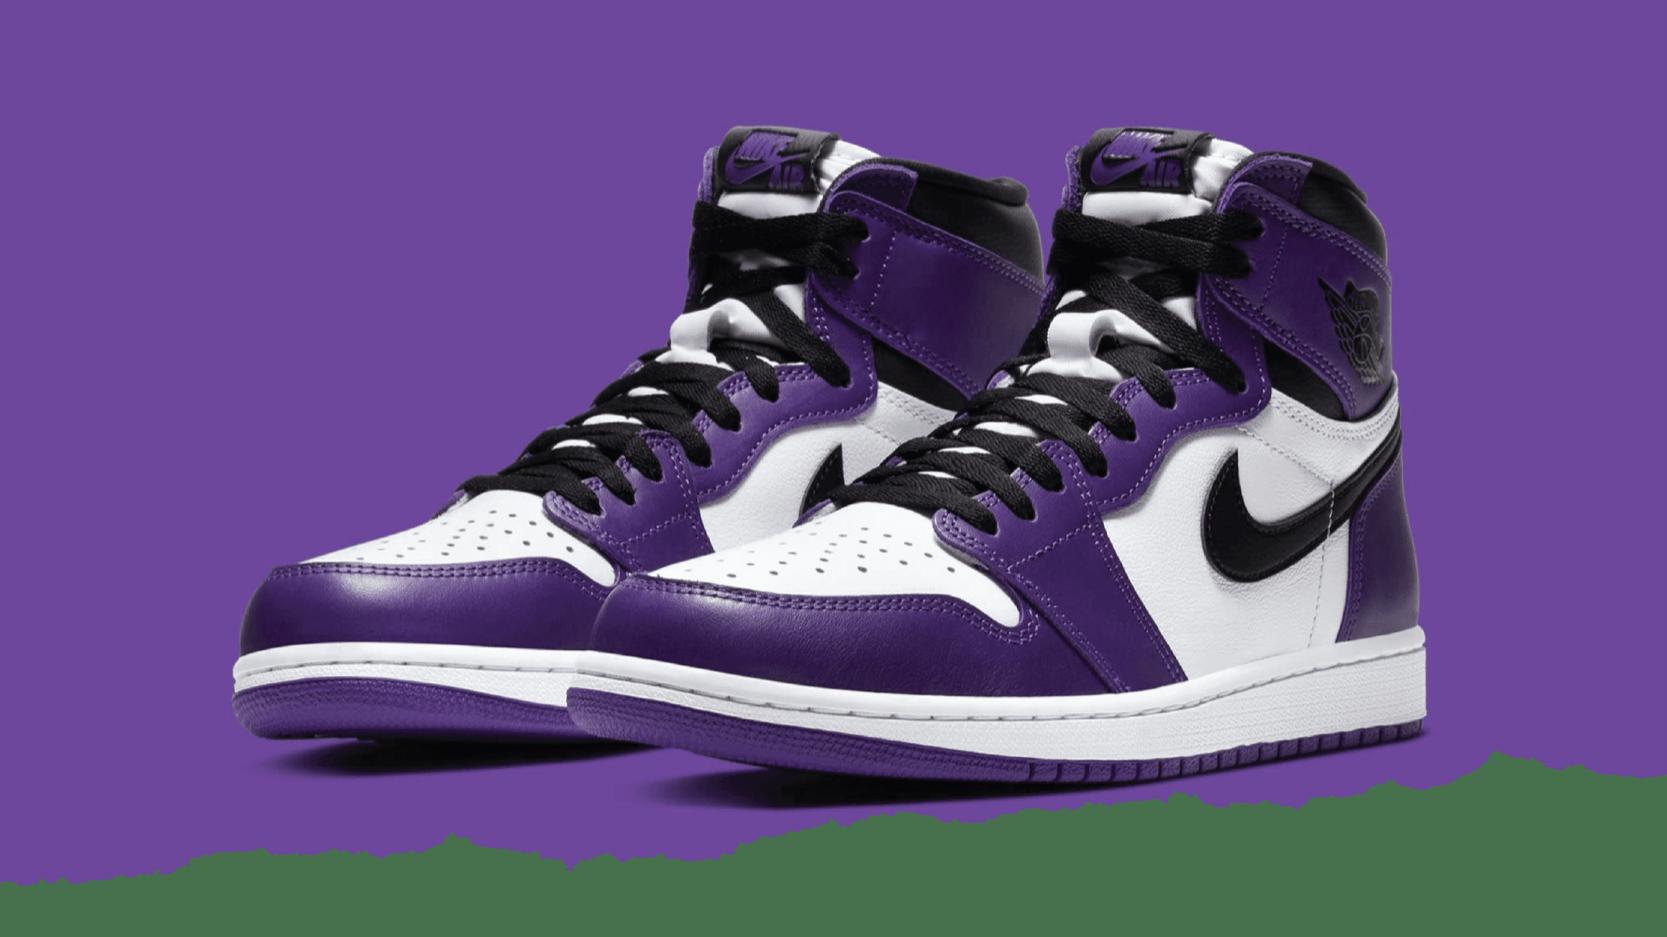 Air Jordan 1 Retro High OG - 'Court Purple'